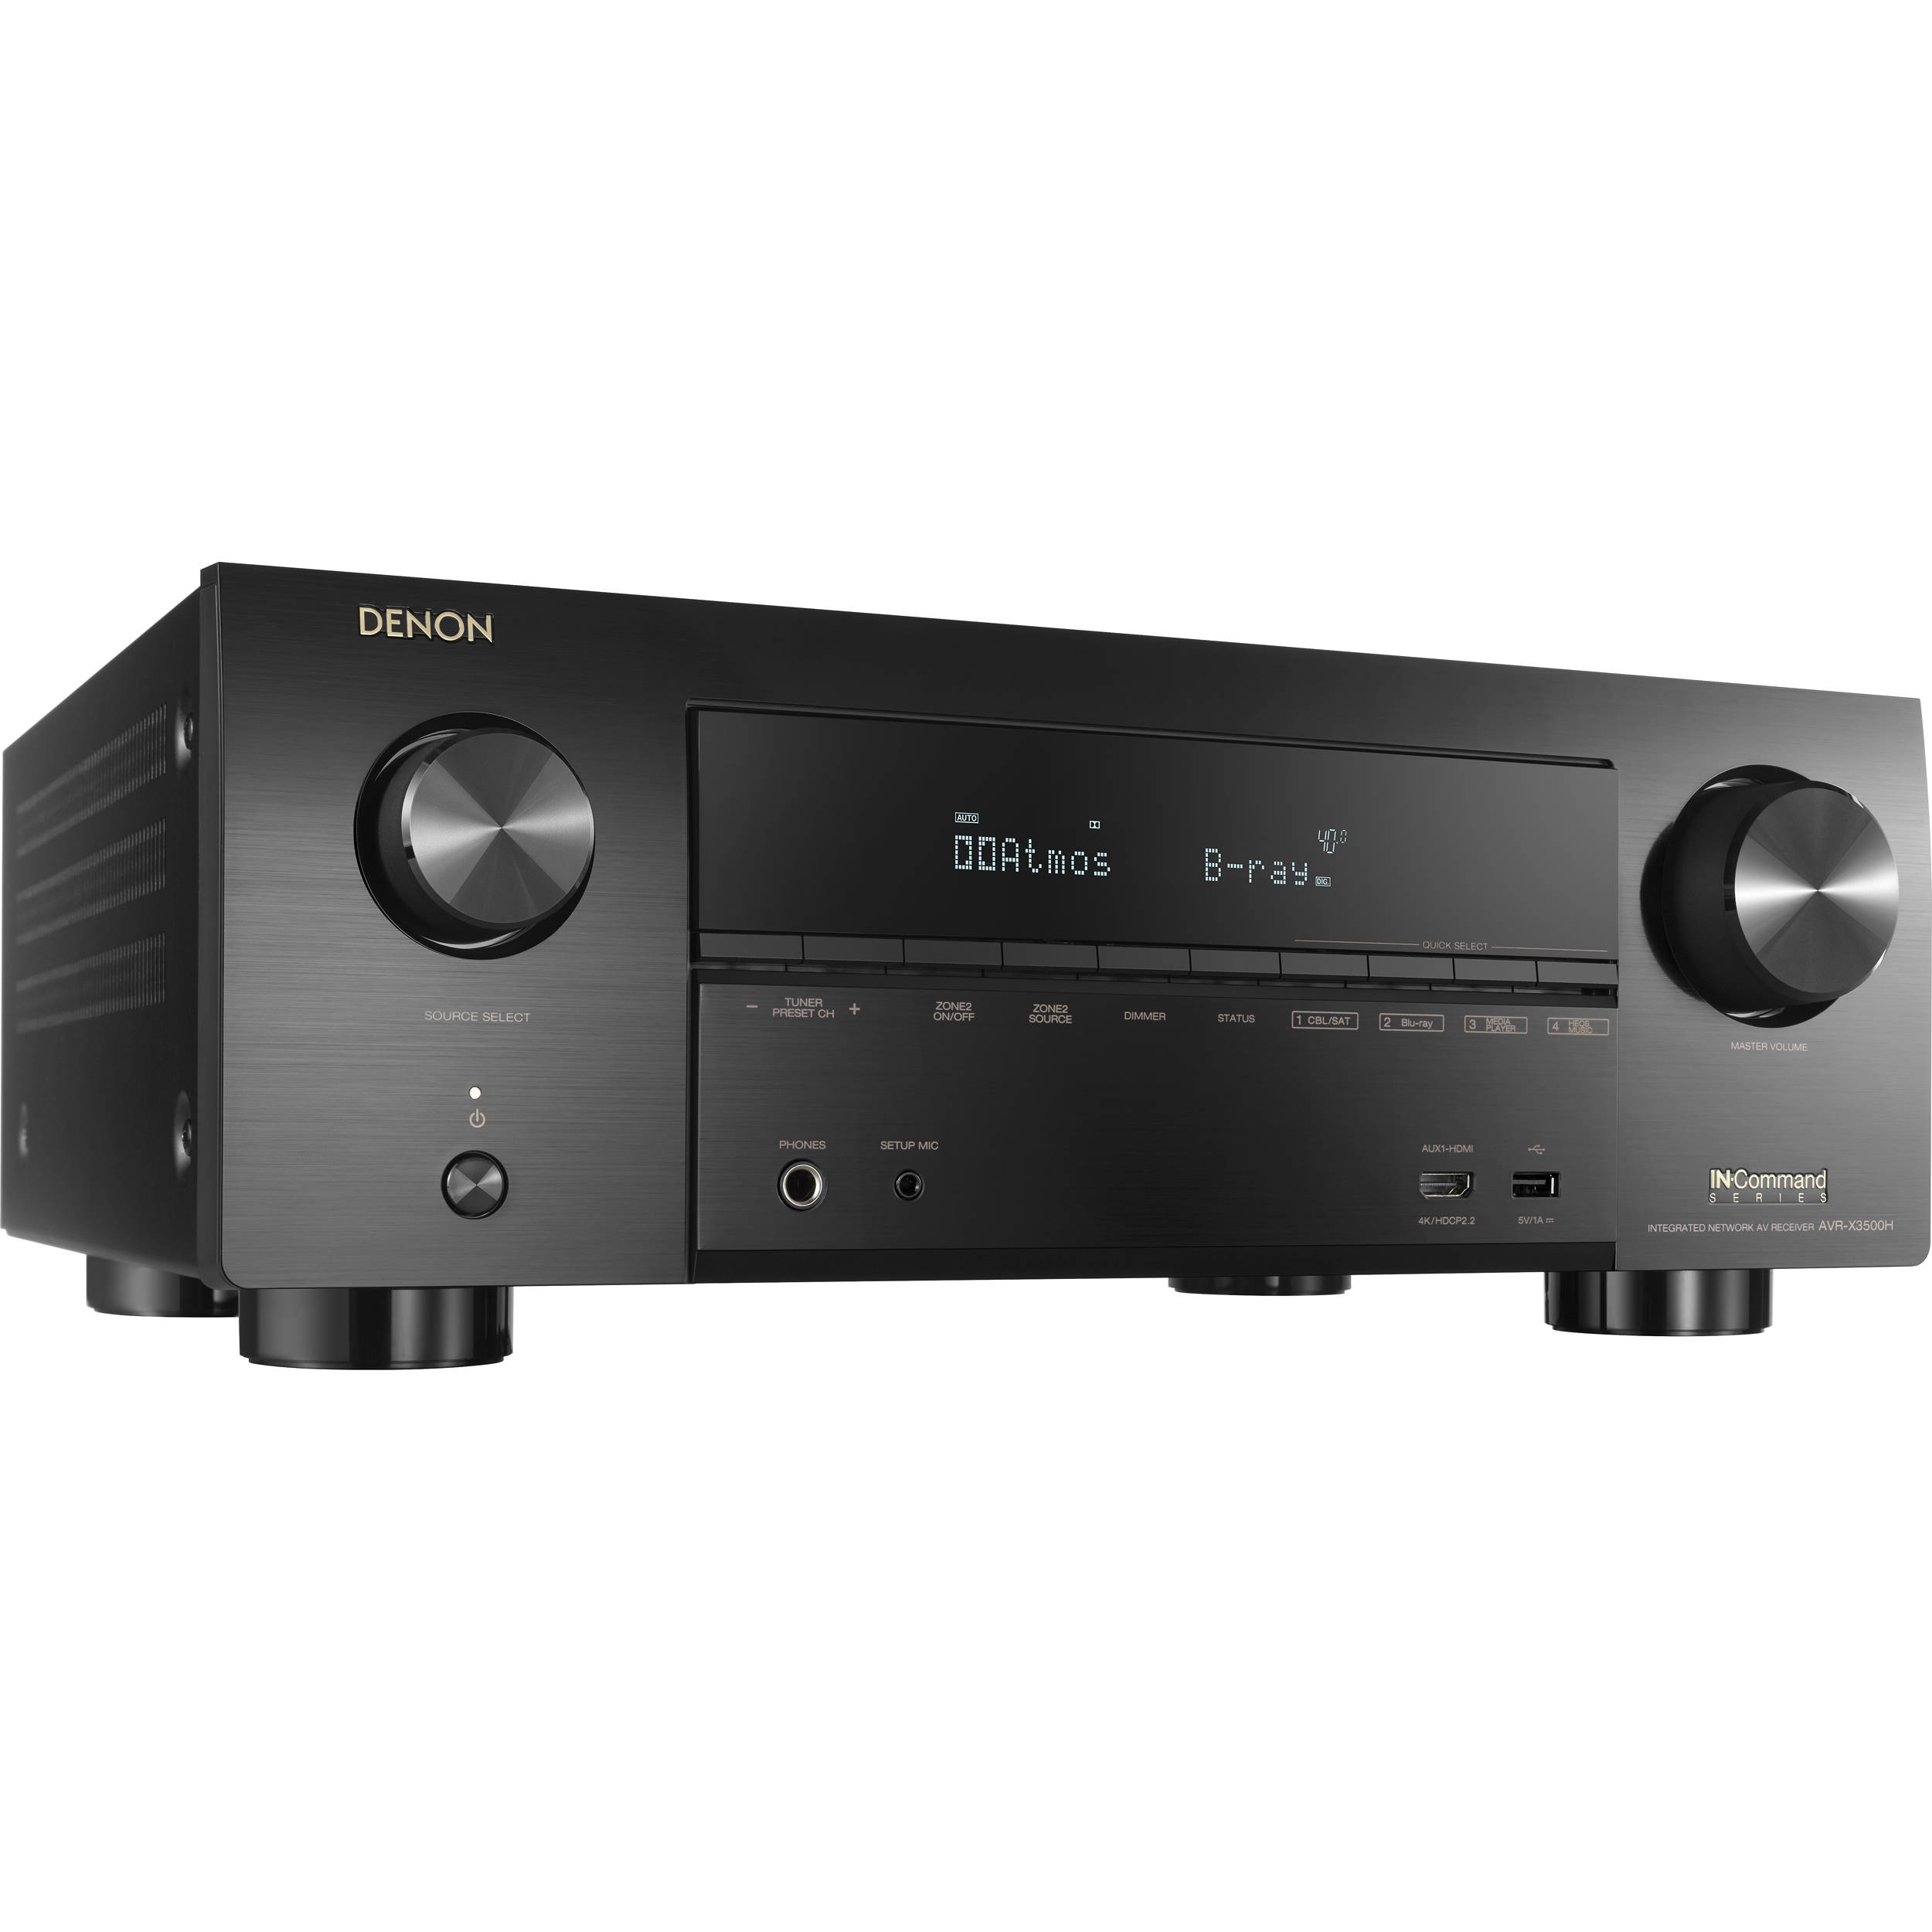 Denon AVR-X3500H 7 2-Channel Network A/V Receiver